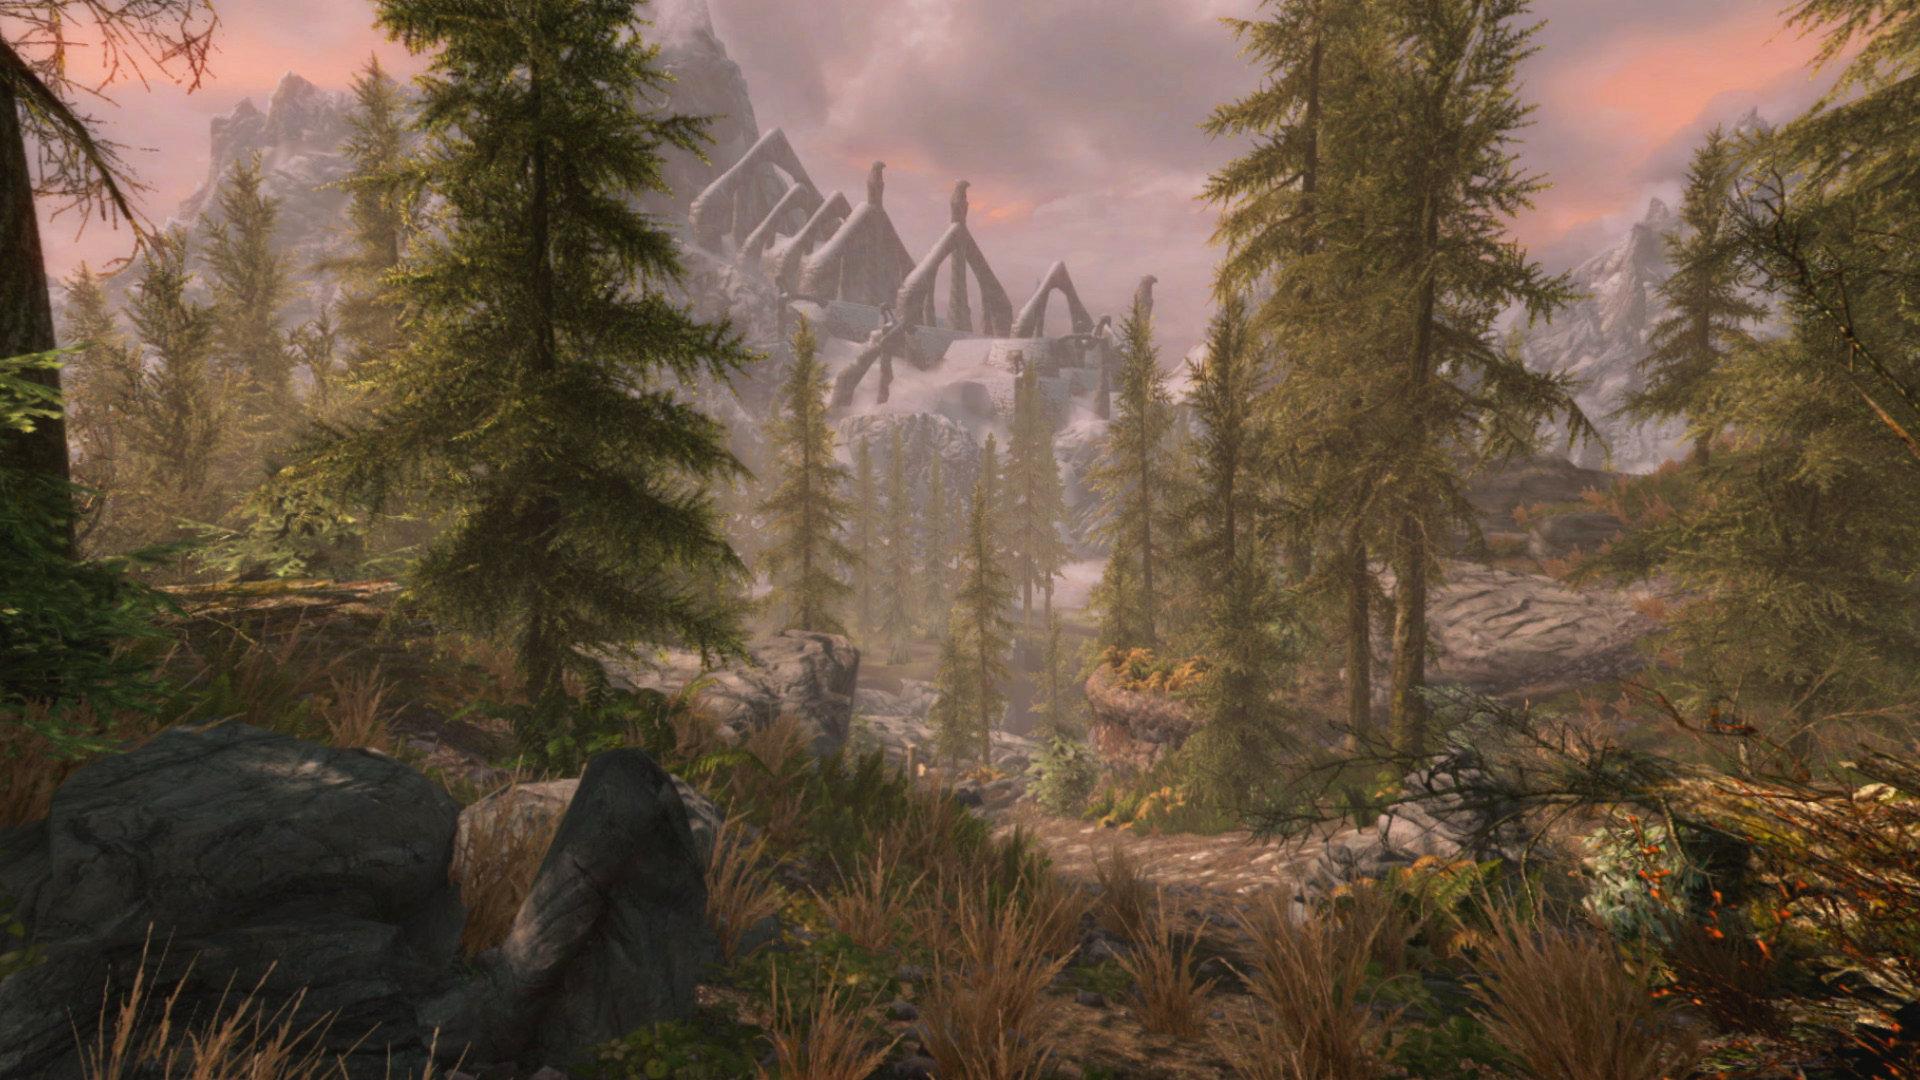 Skyrim VR forest